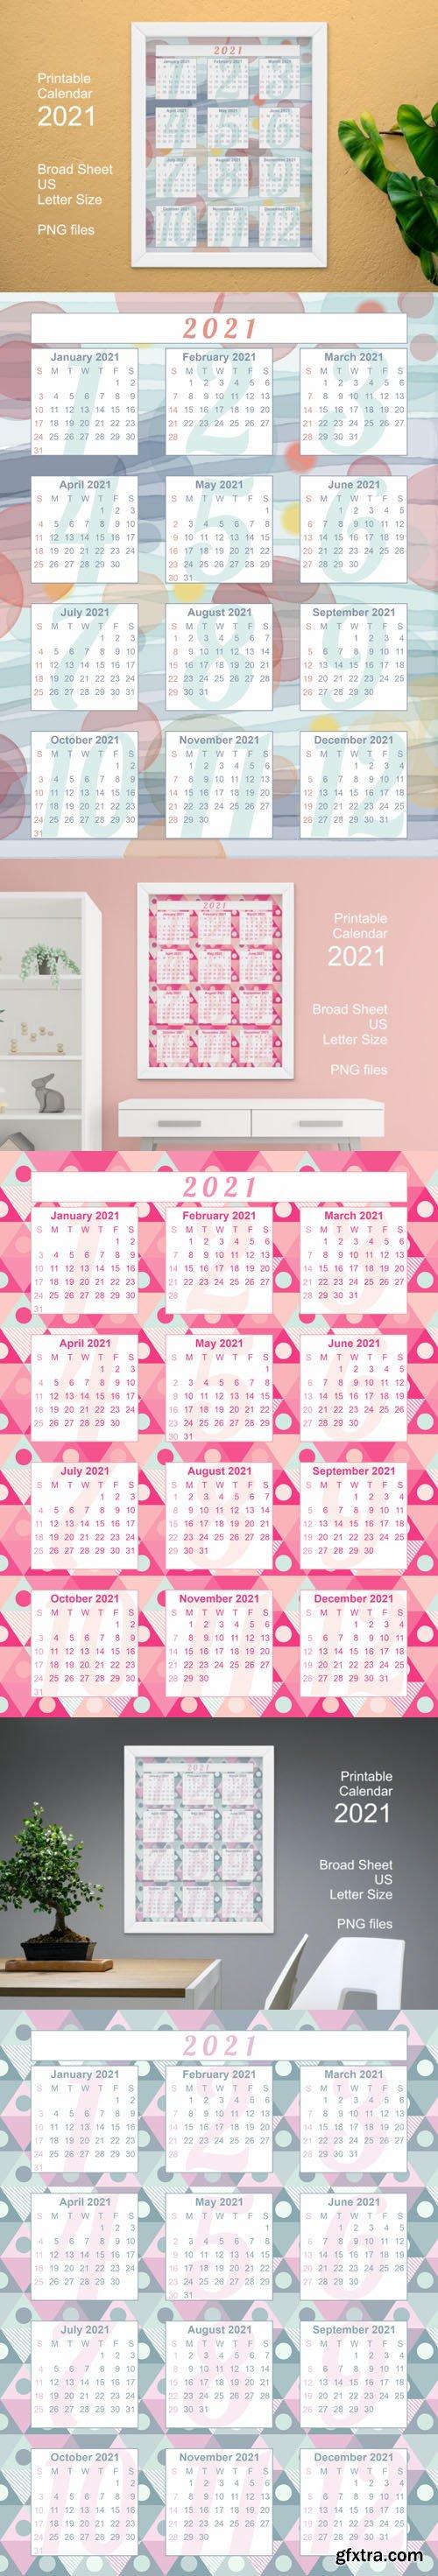 3 Printable Calendar 2021 in PNG